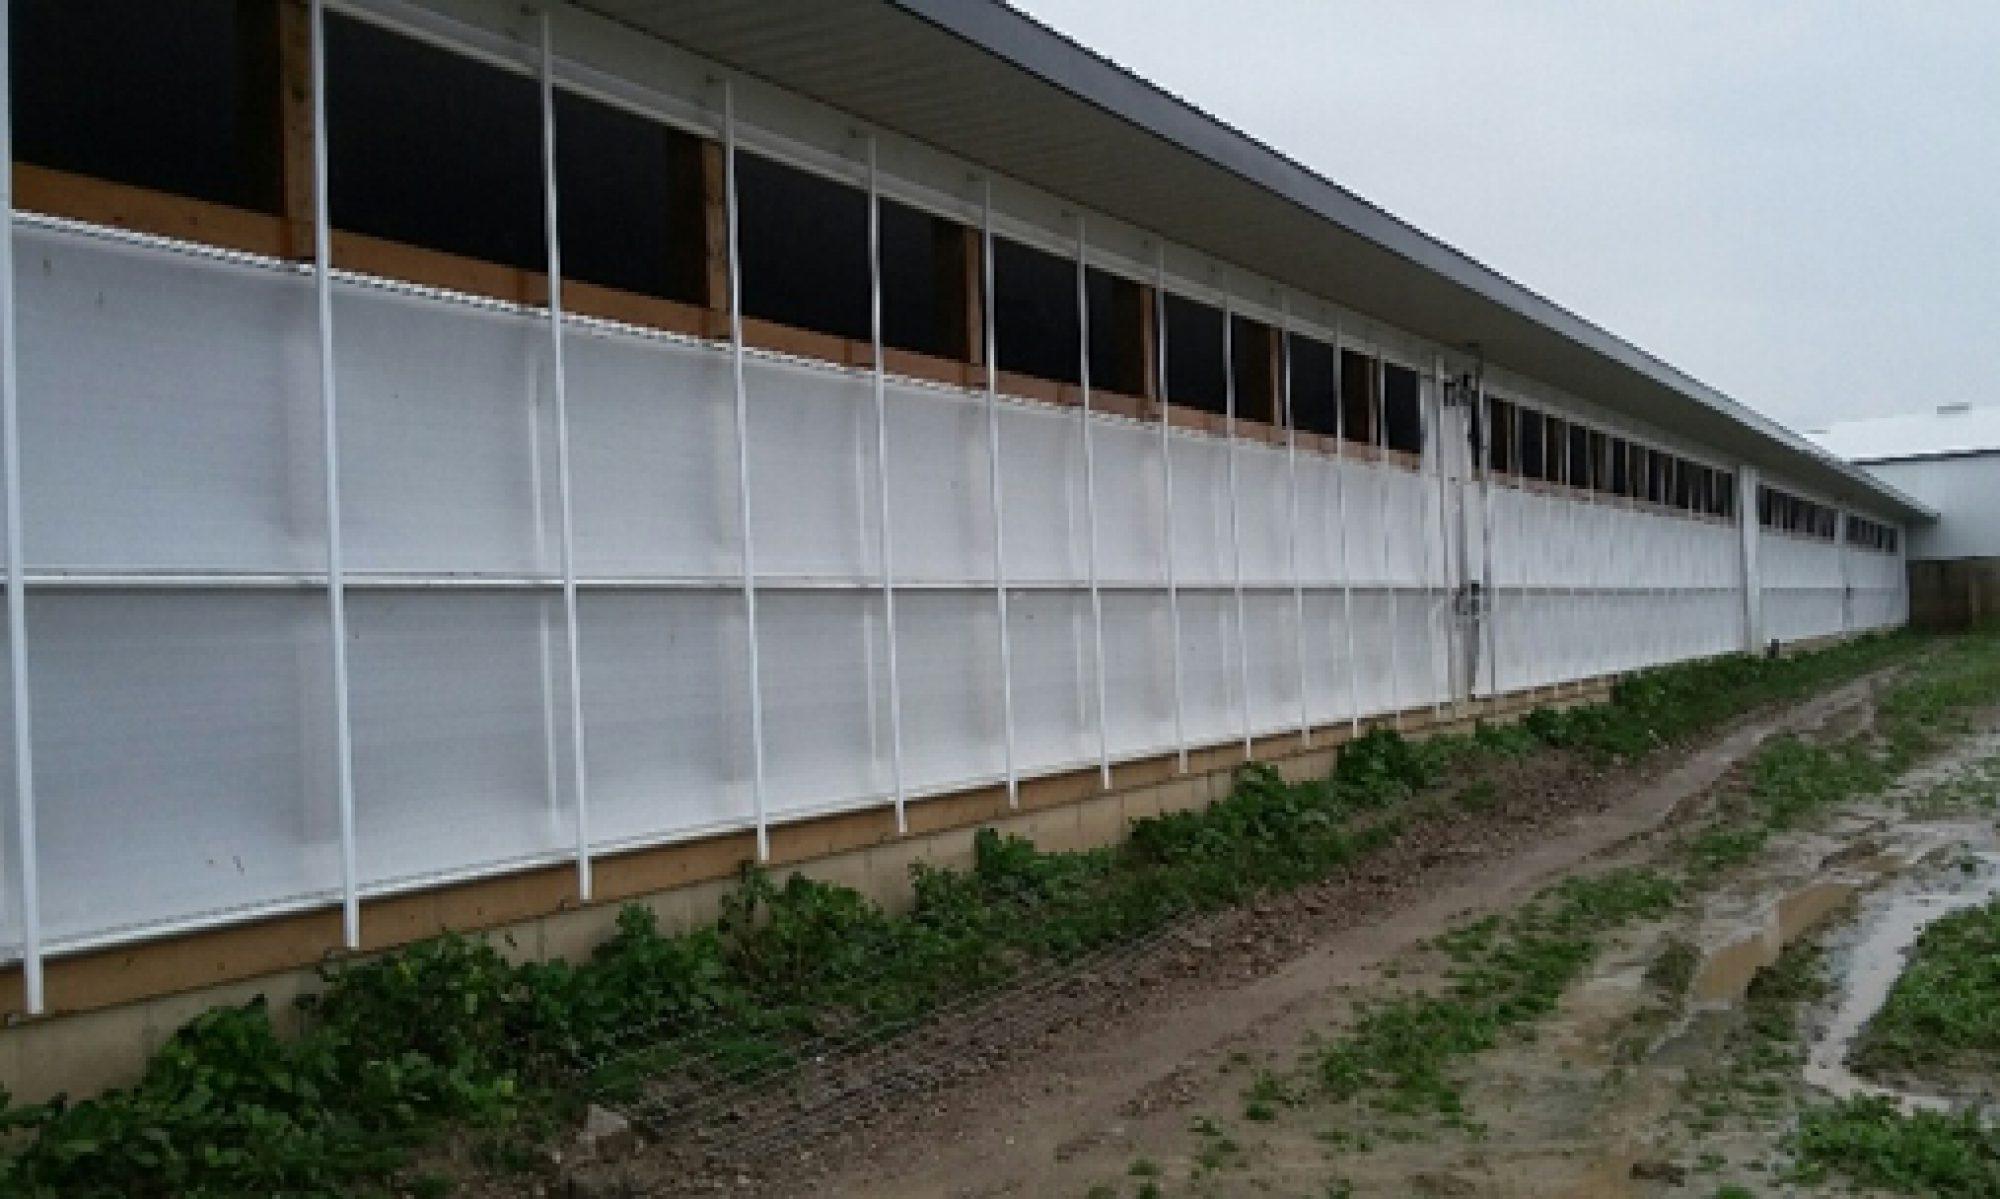 Huron Ventilation Systems